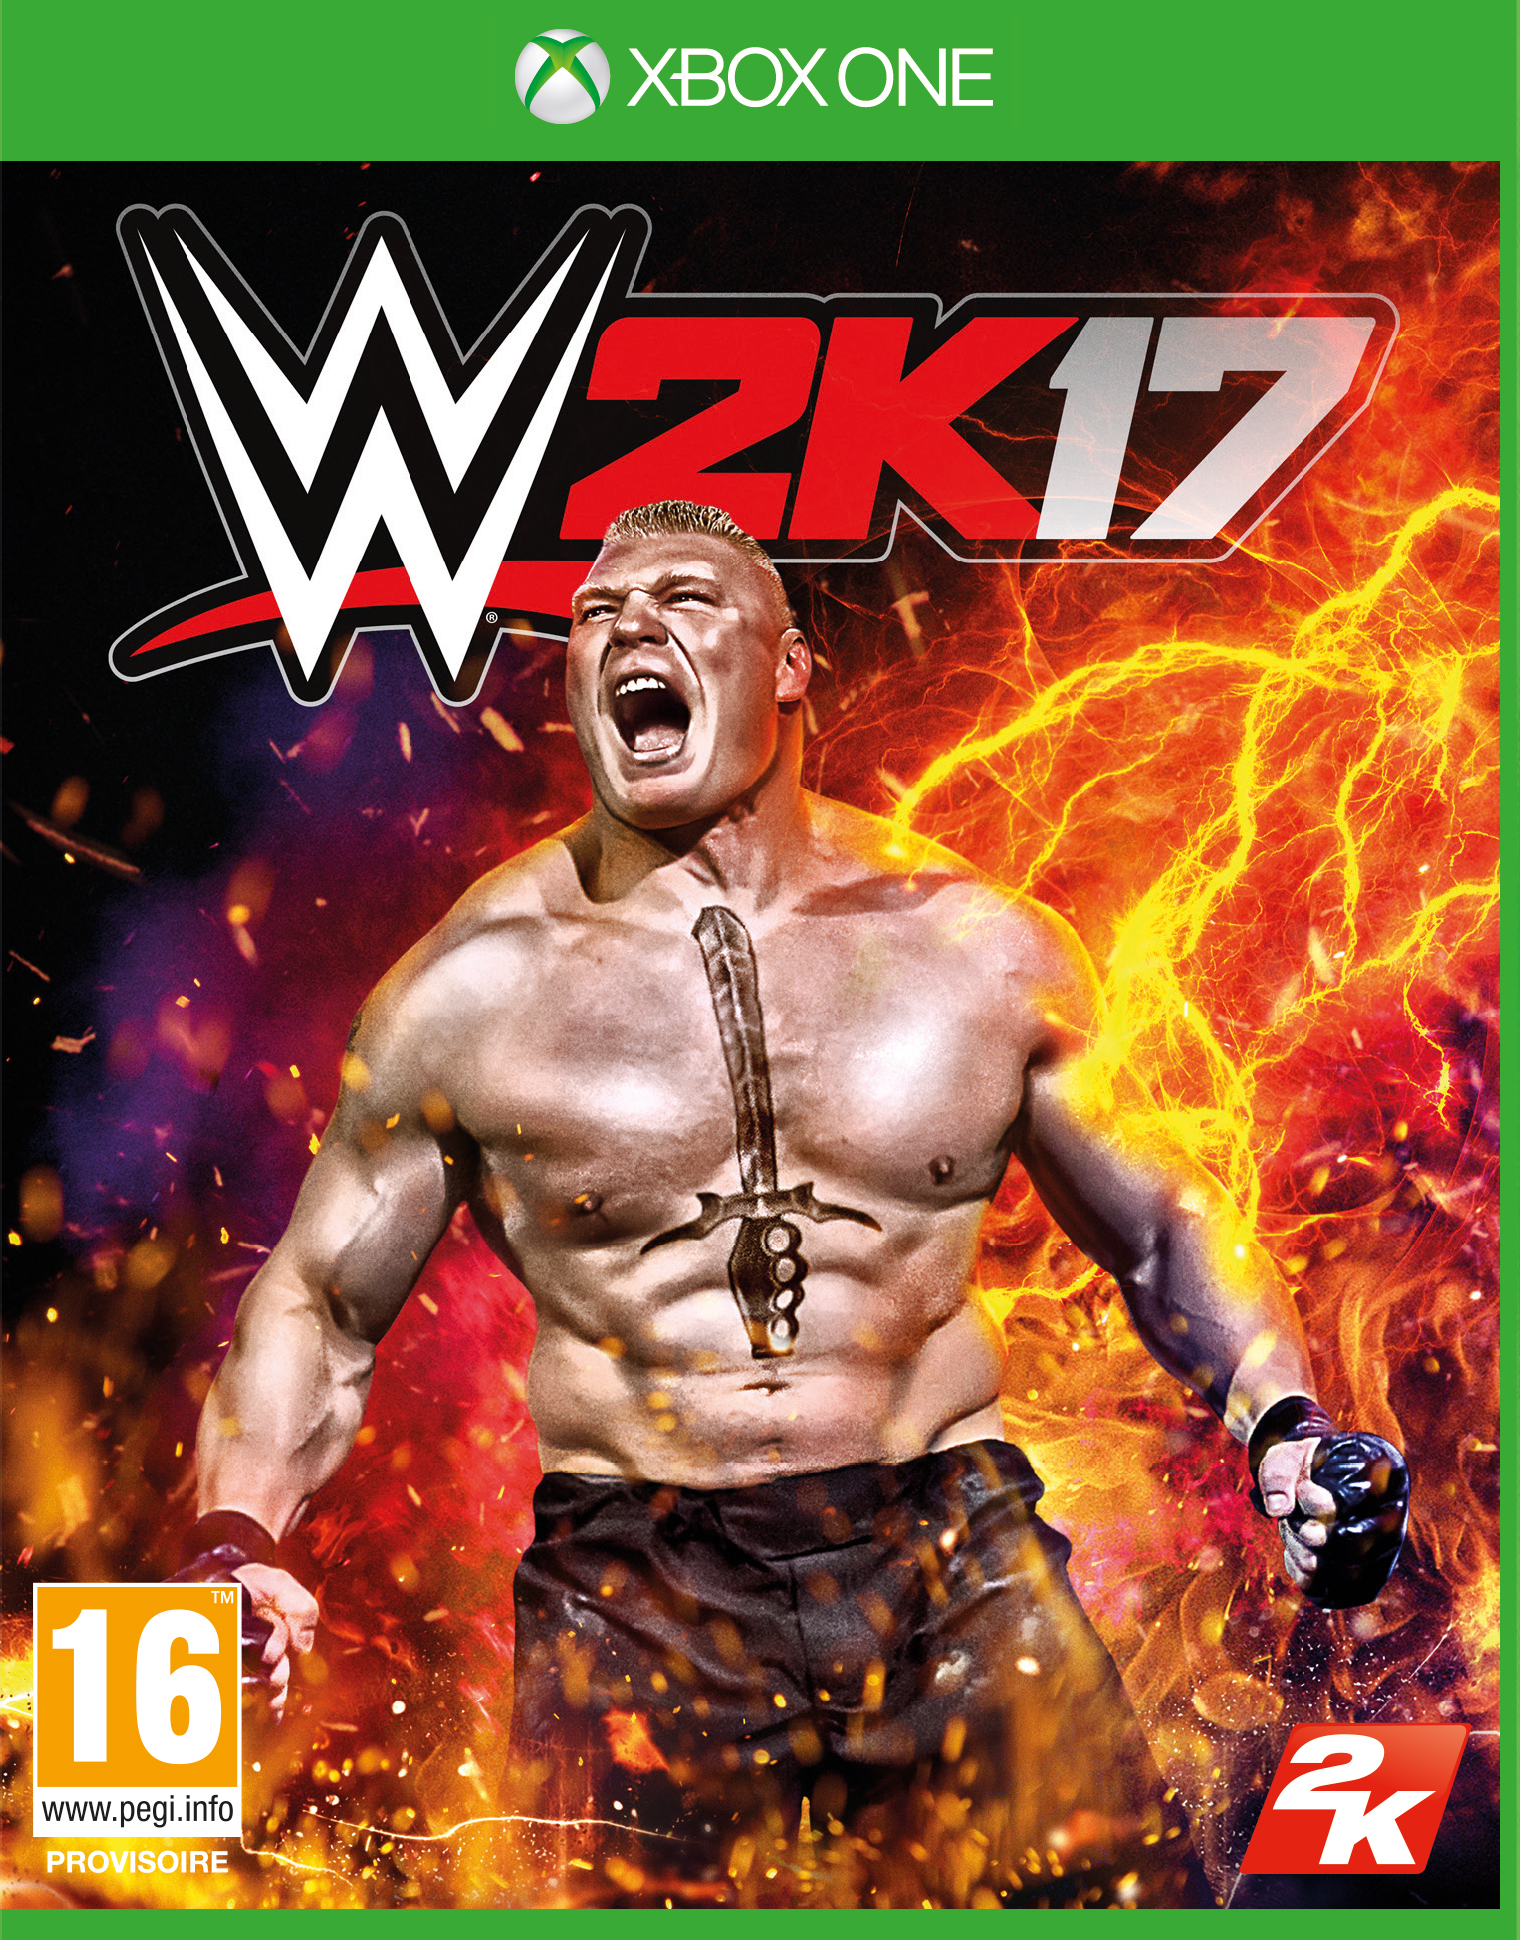 WWE2K17 XB1 Jaquette 001